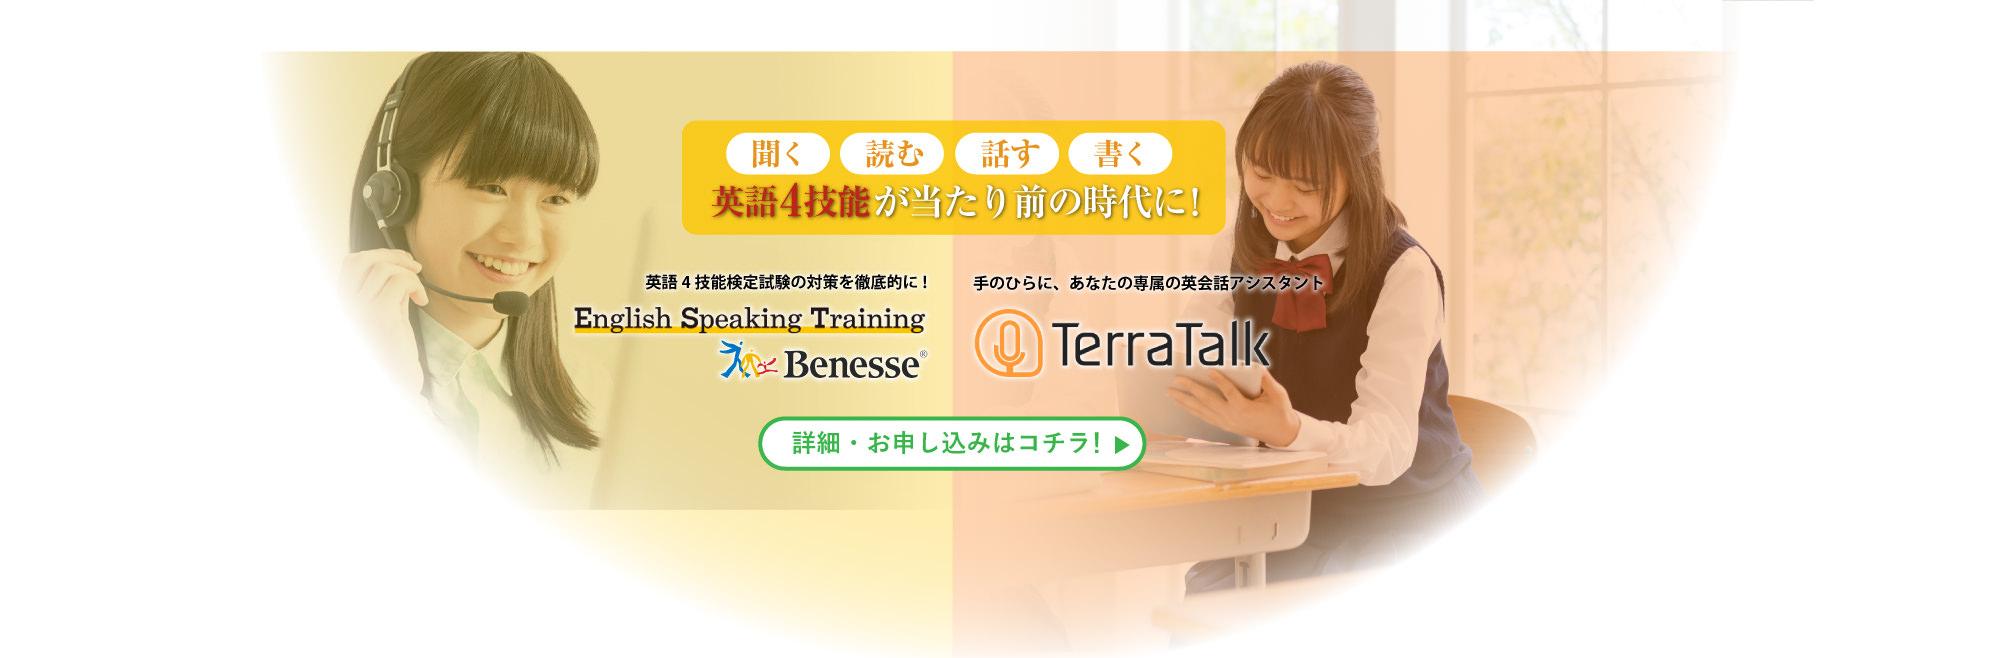 EST/テラトーク